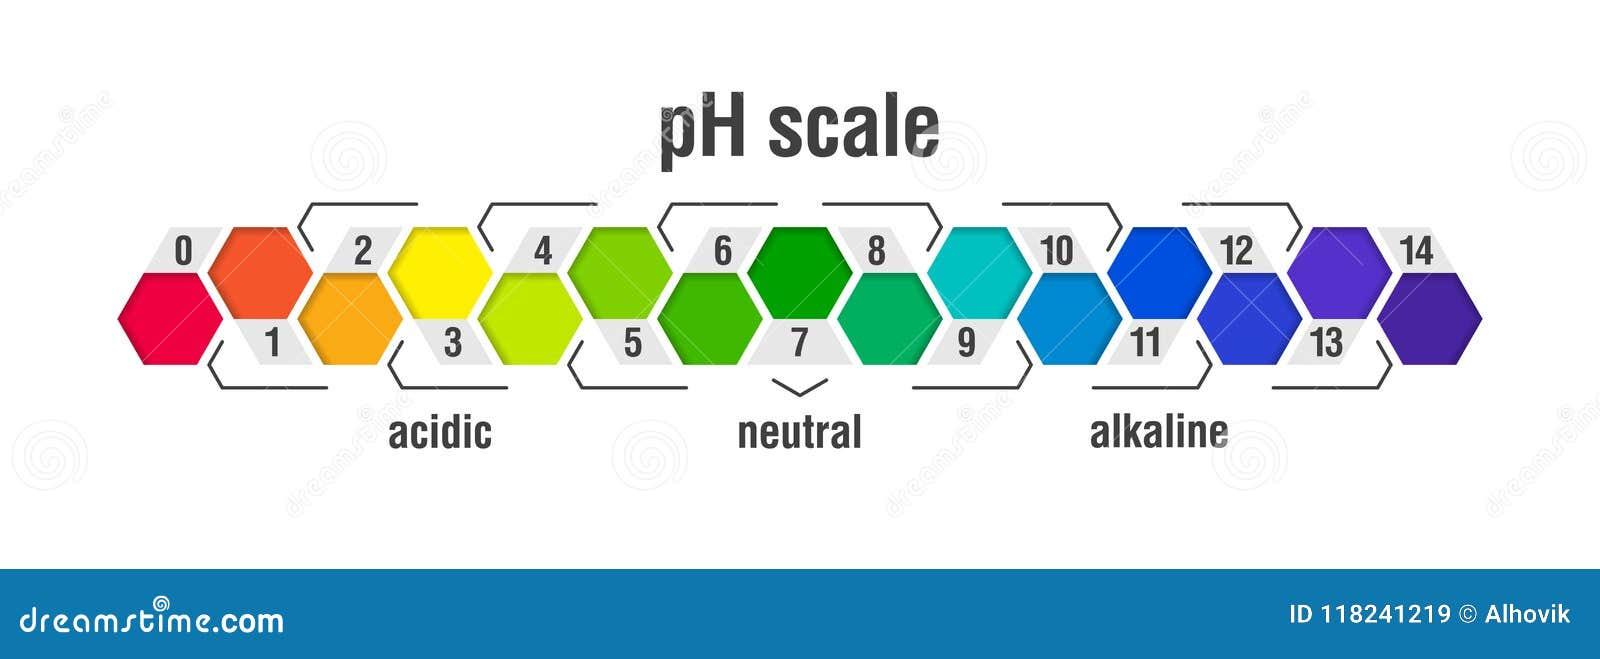 Диаграмма масштаба значения ПЭ-АШ